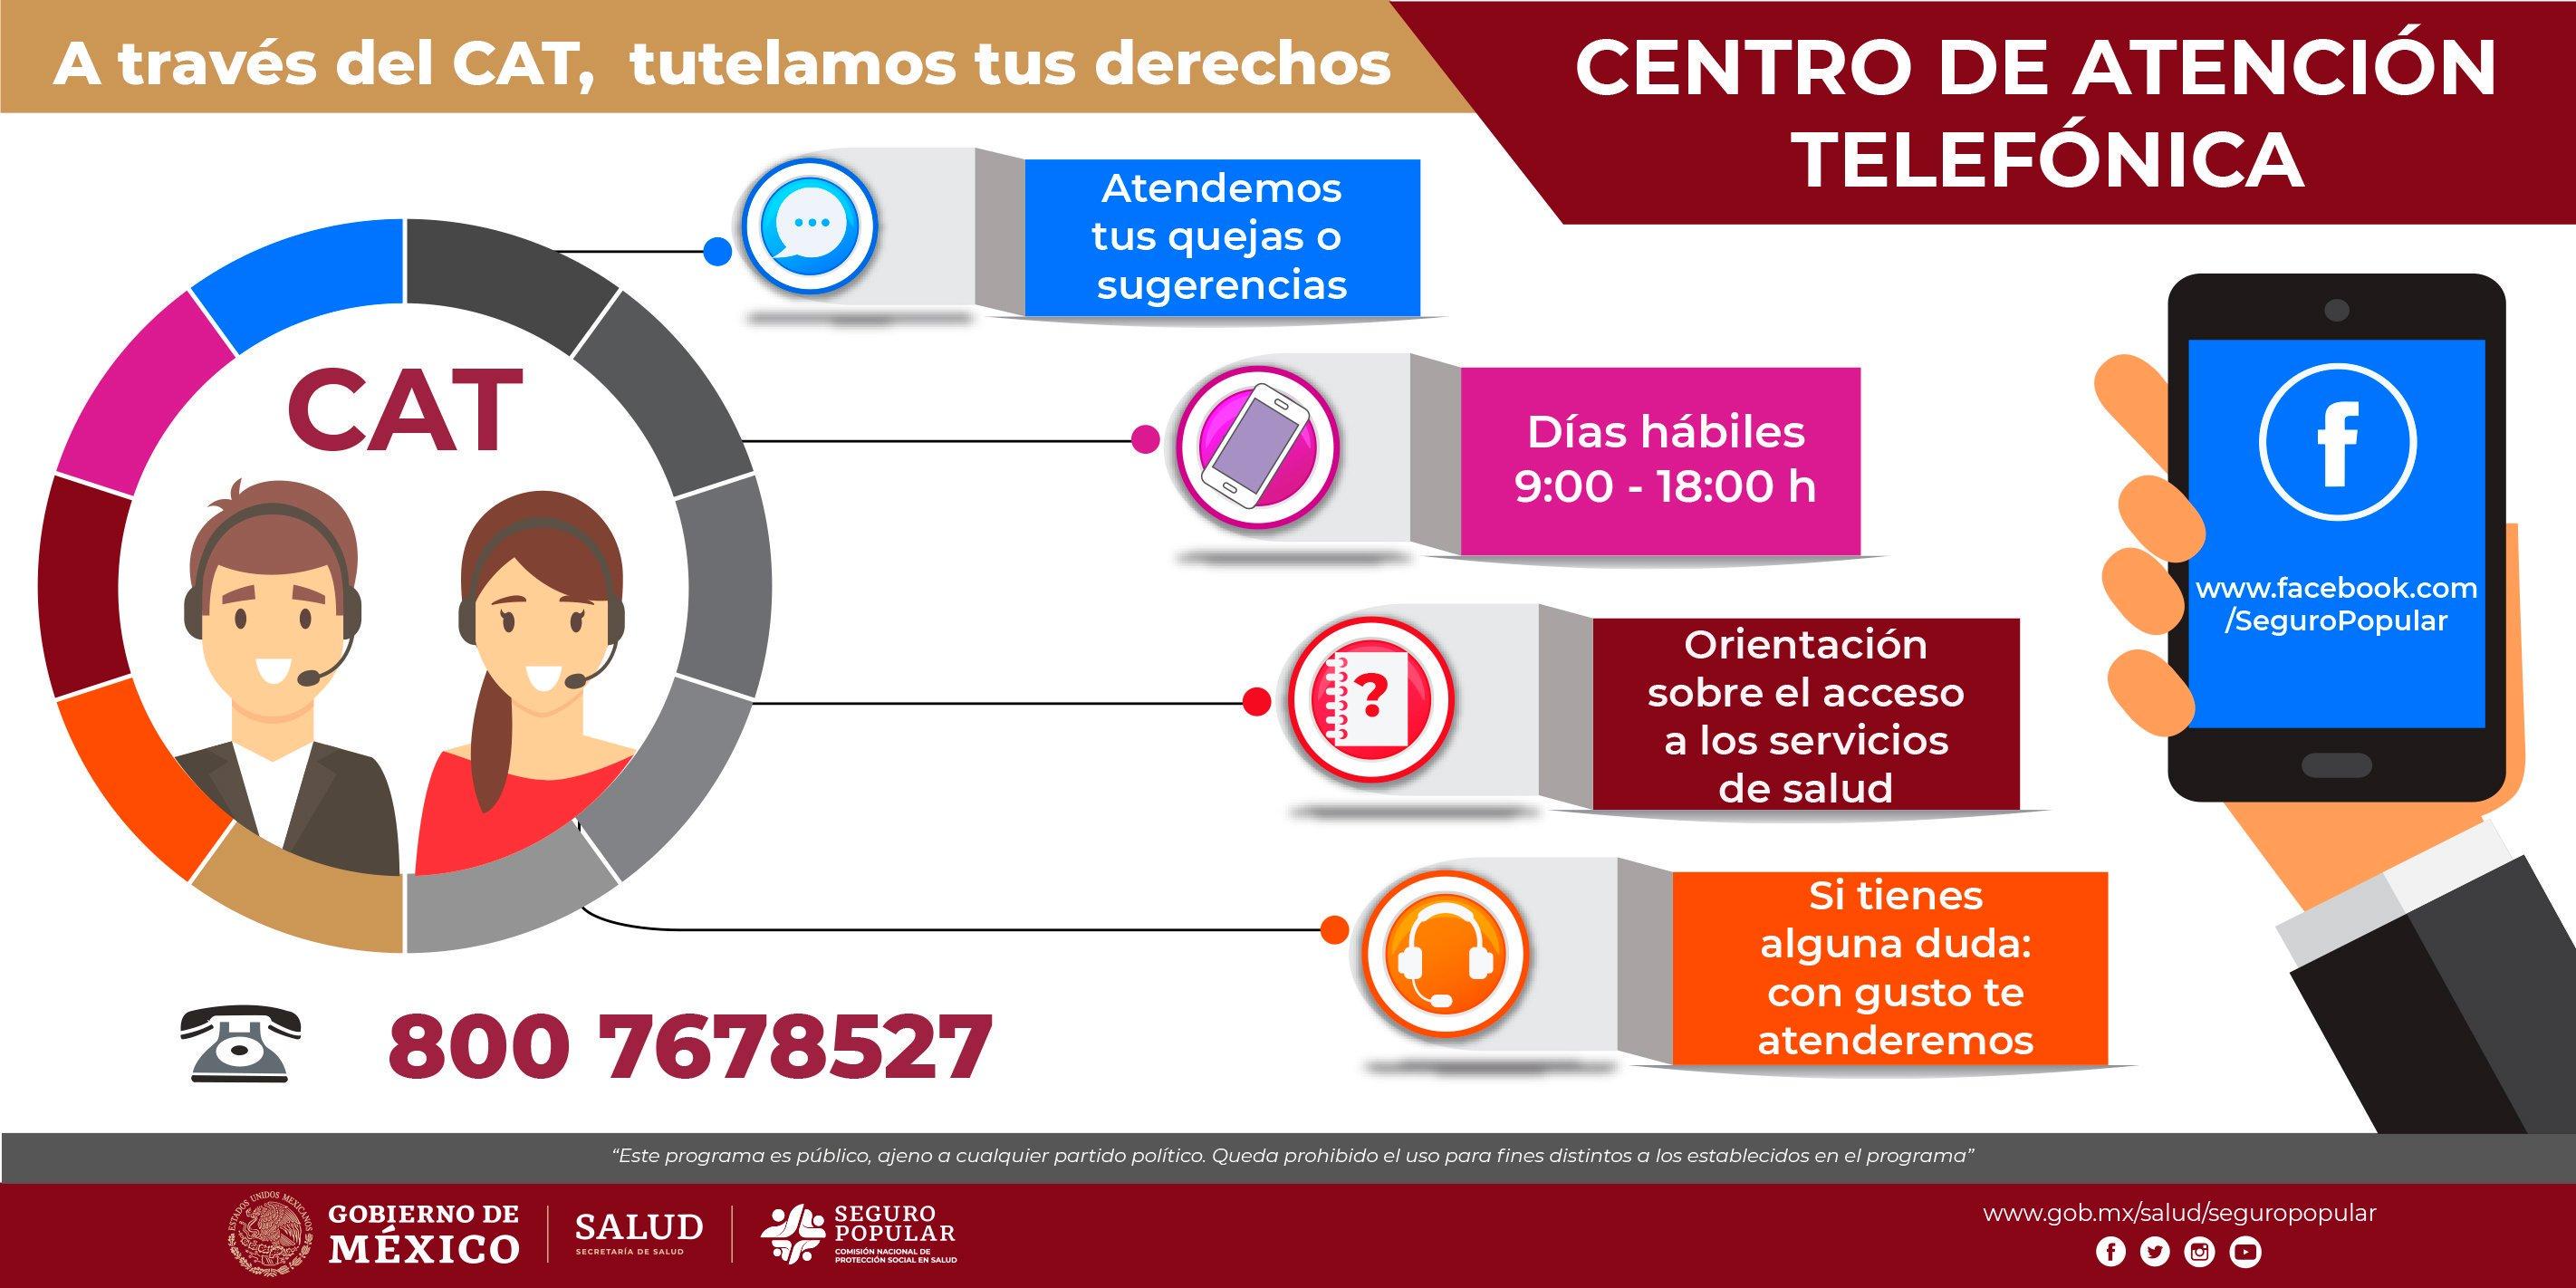 Centro de Atención Telefónica: 800 (POPULAR) 7678 527.